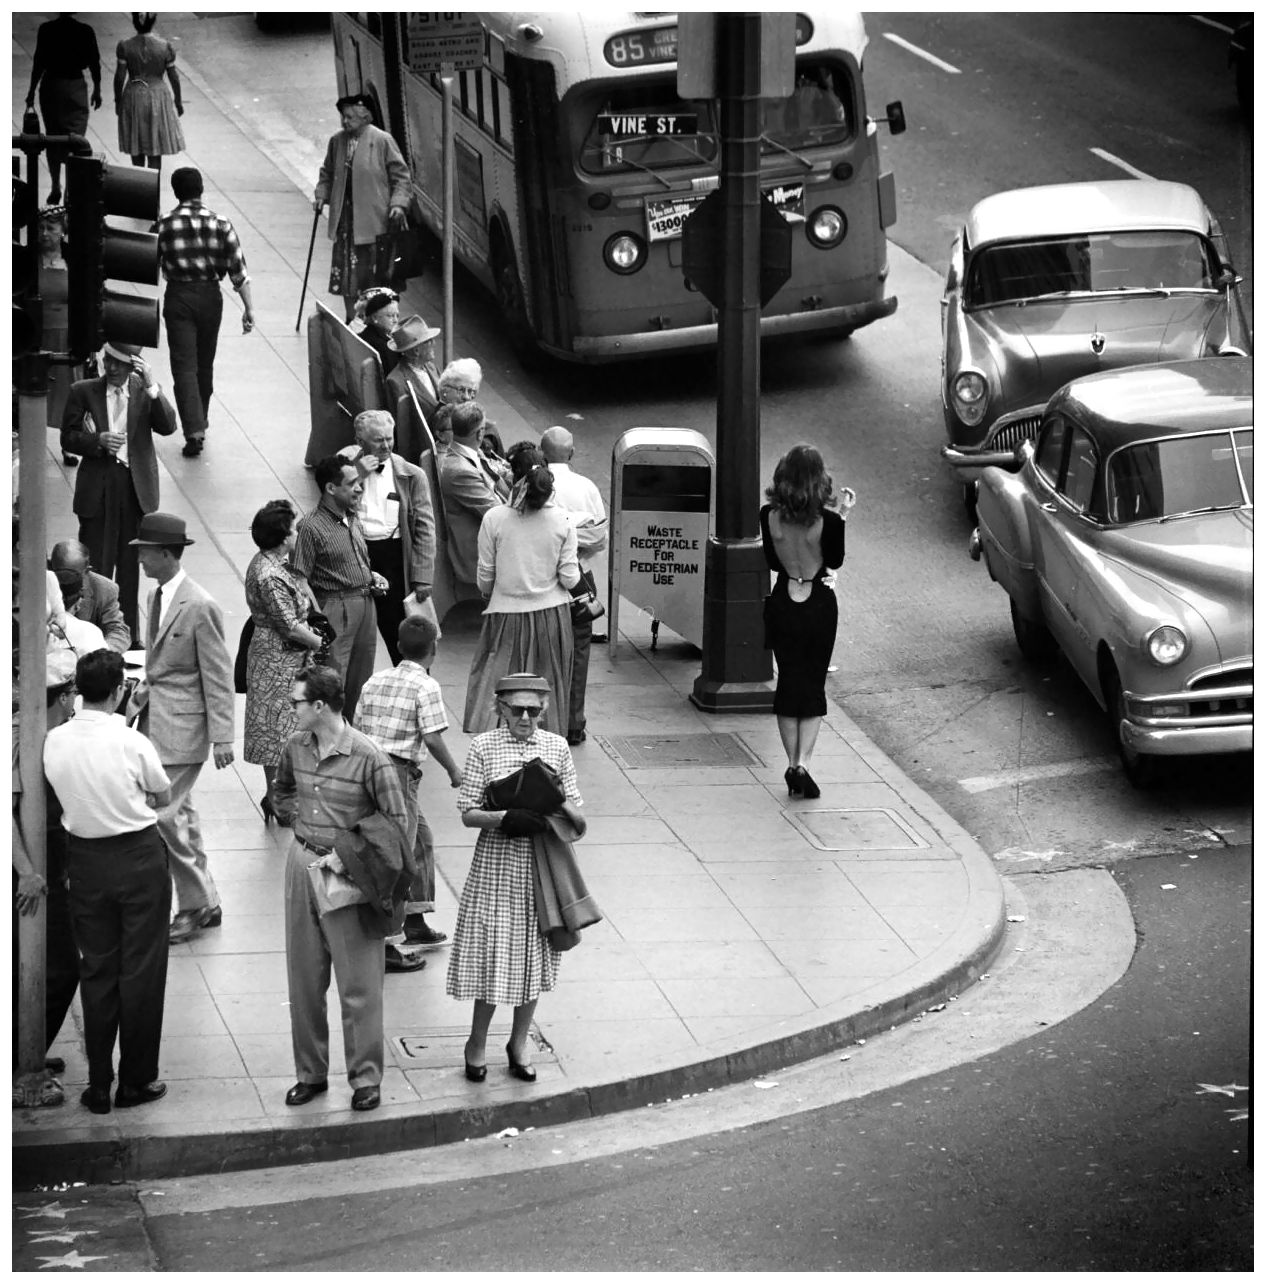 Vikki Dougan in Vine Street, Hollywood, photographed by Ralph Crane for Life Magazine, 1957.